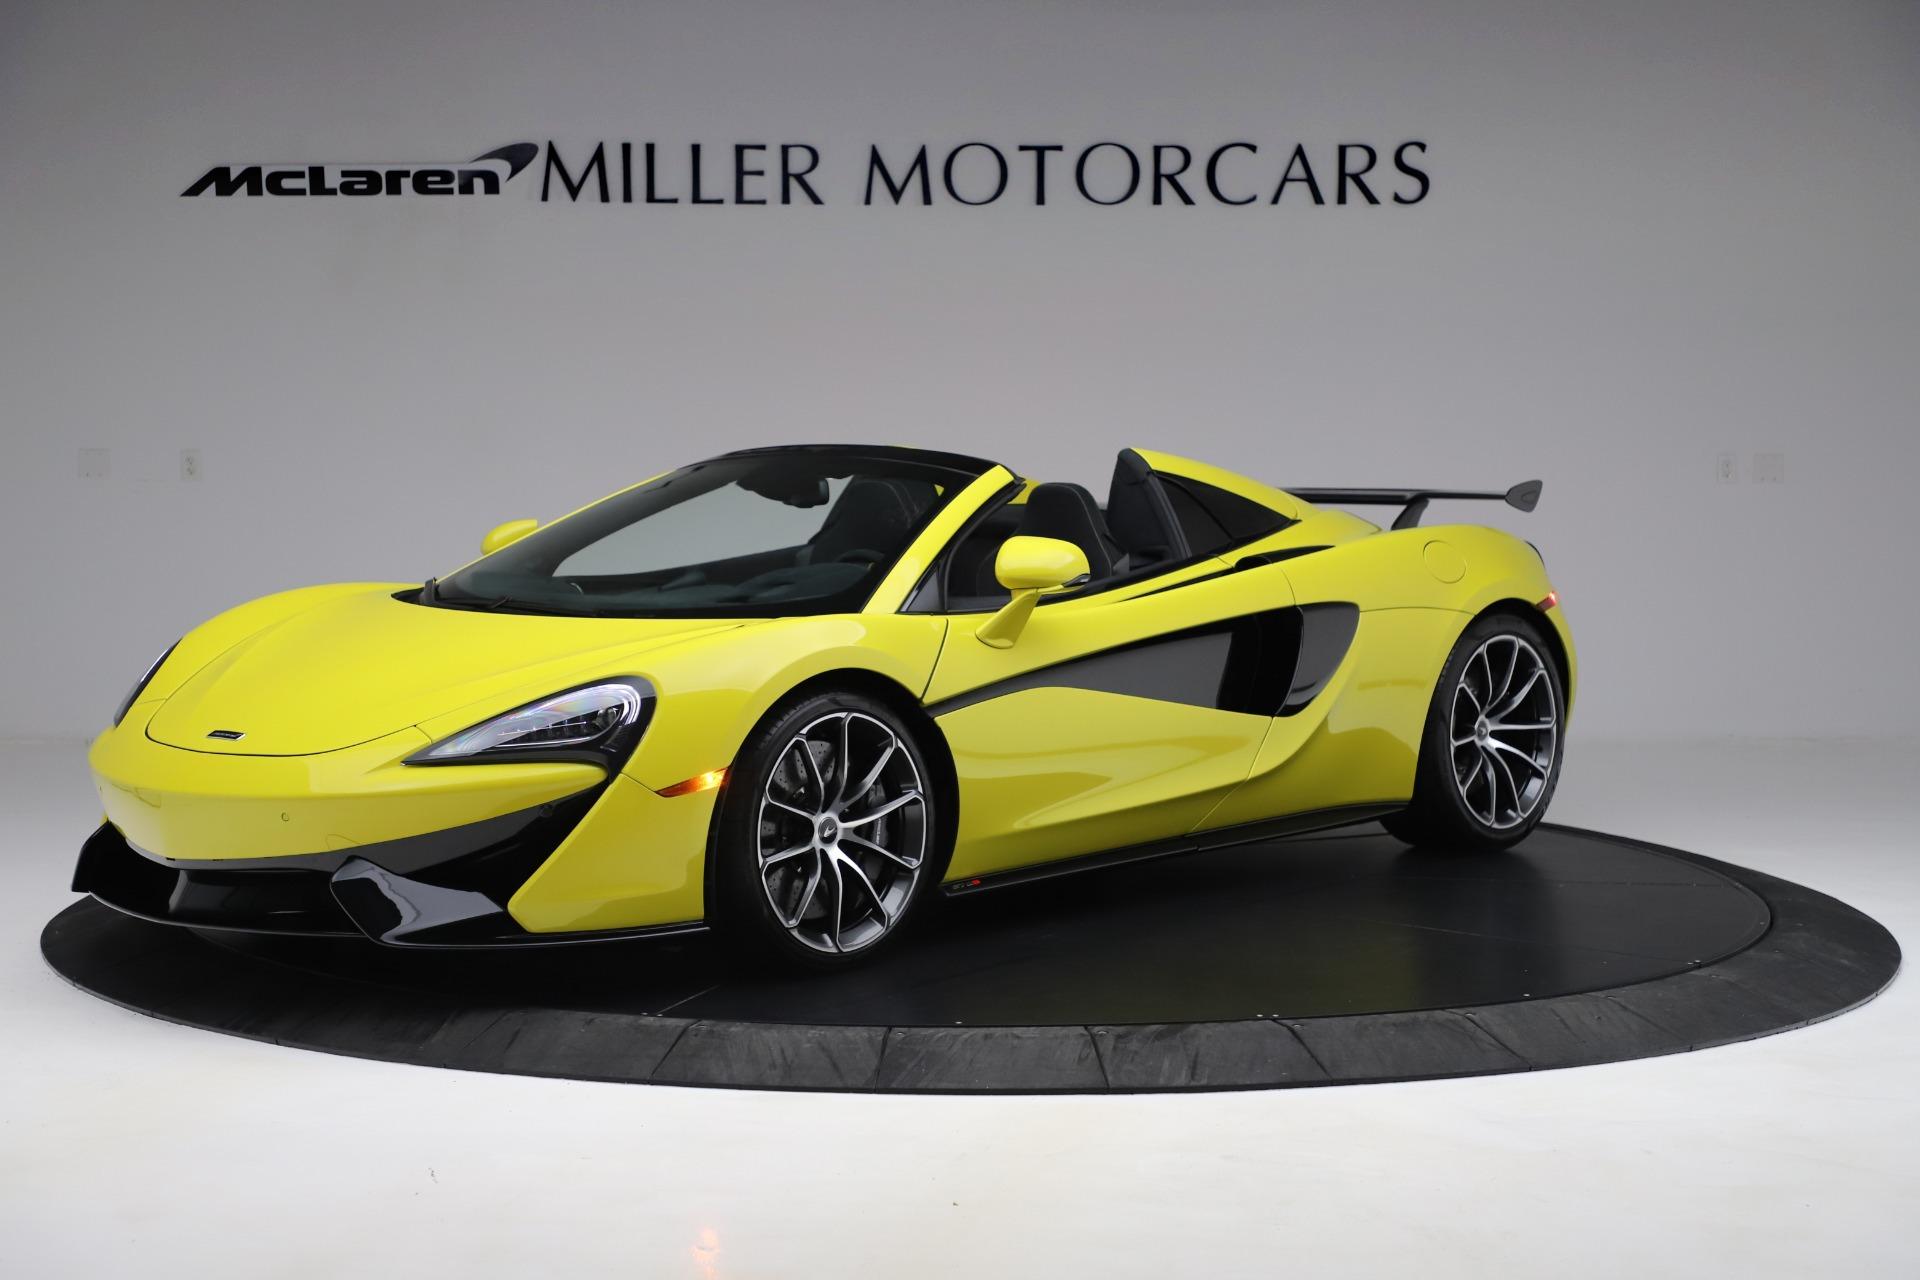 New 2019 McLaren 570S SPIDER Convertible for sale $227,660 at McLaren Greenwich in Greenwich CT 06830 1